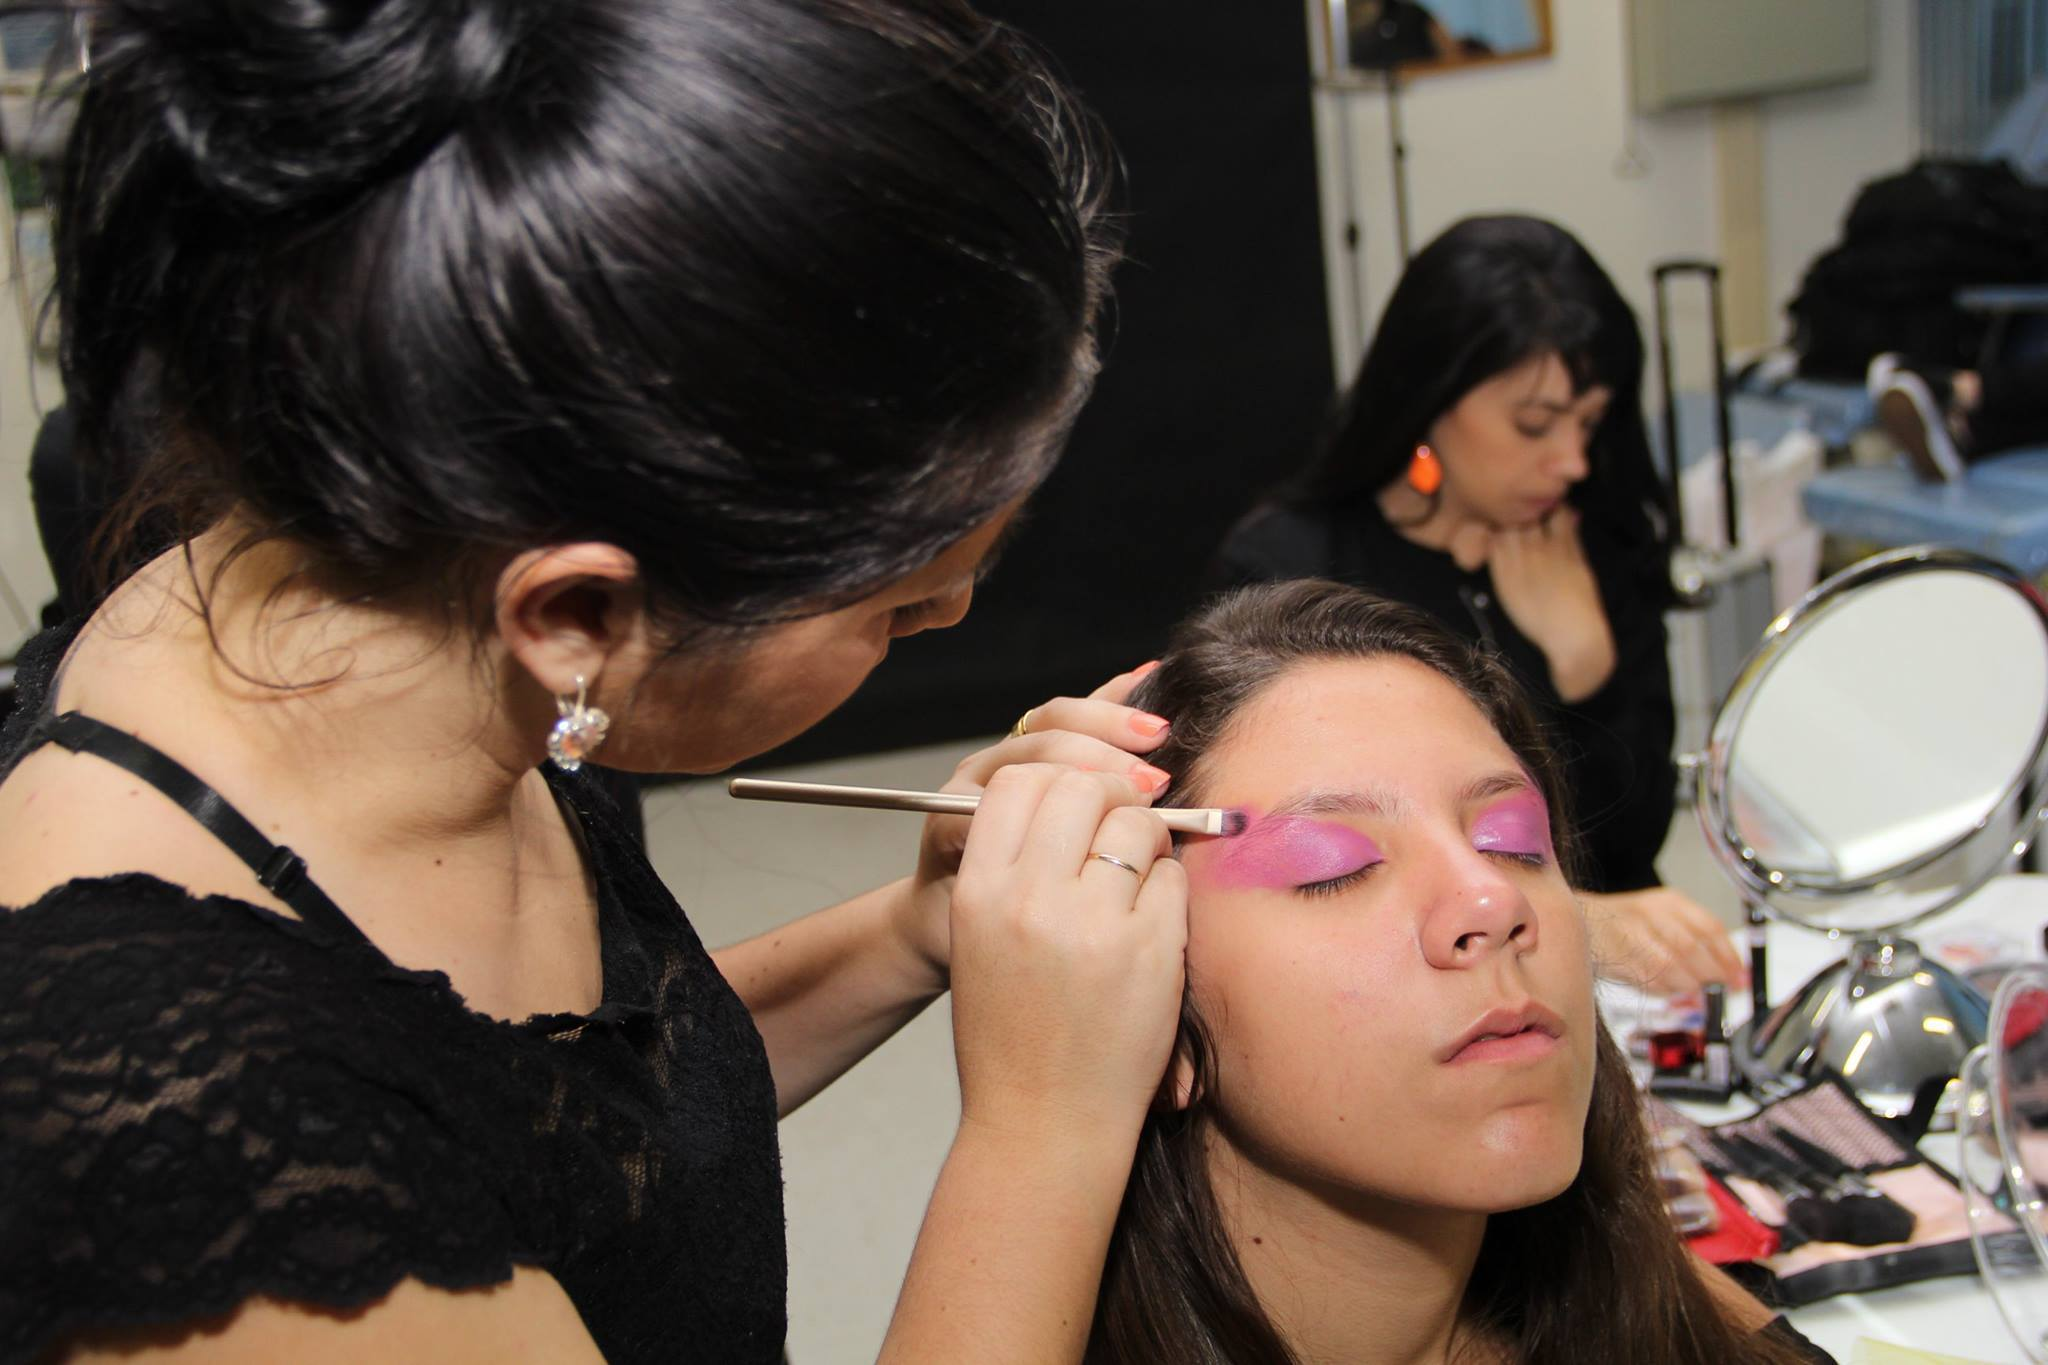 Desfile Senac maquiador(a)